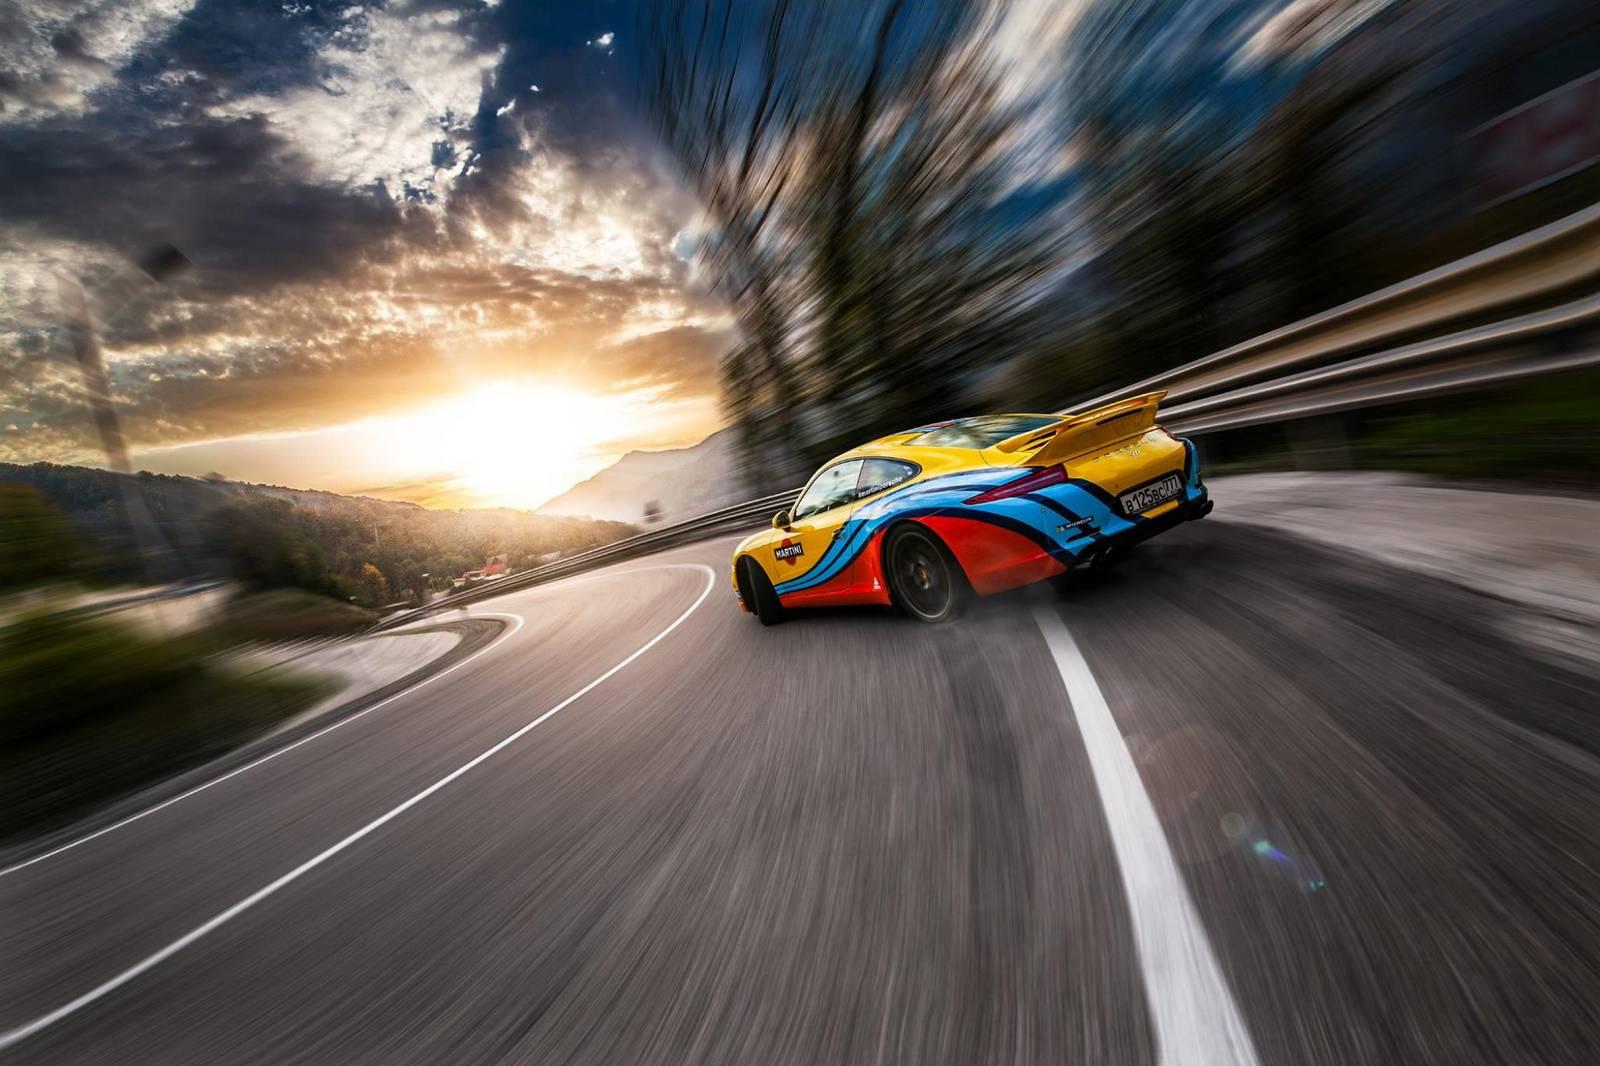 Gallery Porsche Cars In Martini Racing Stripes In Sochi Gtspirit